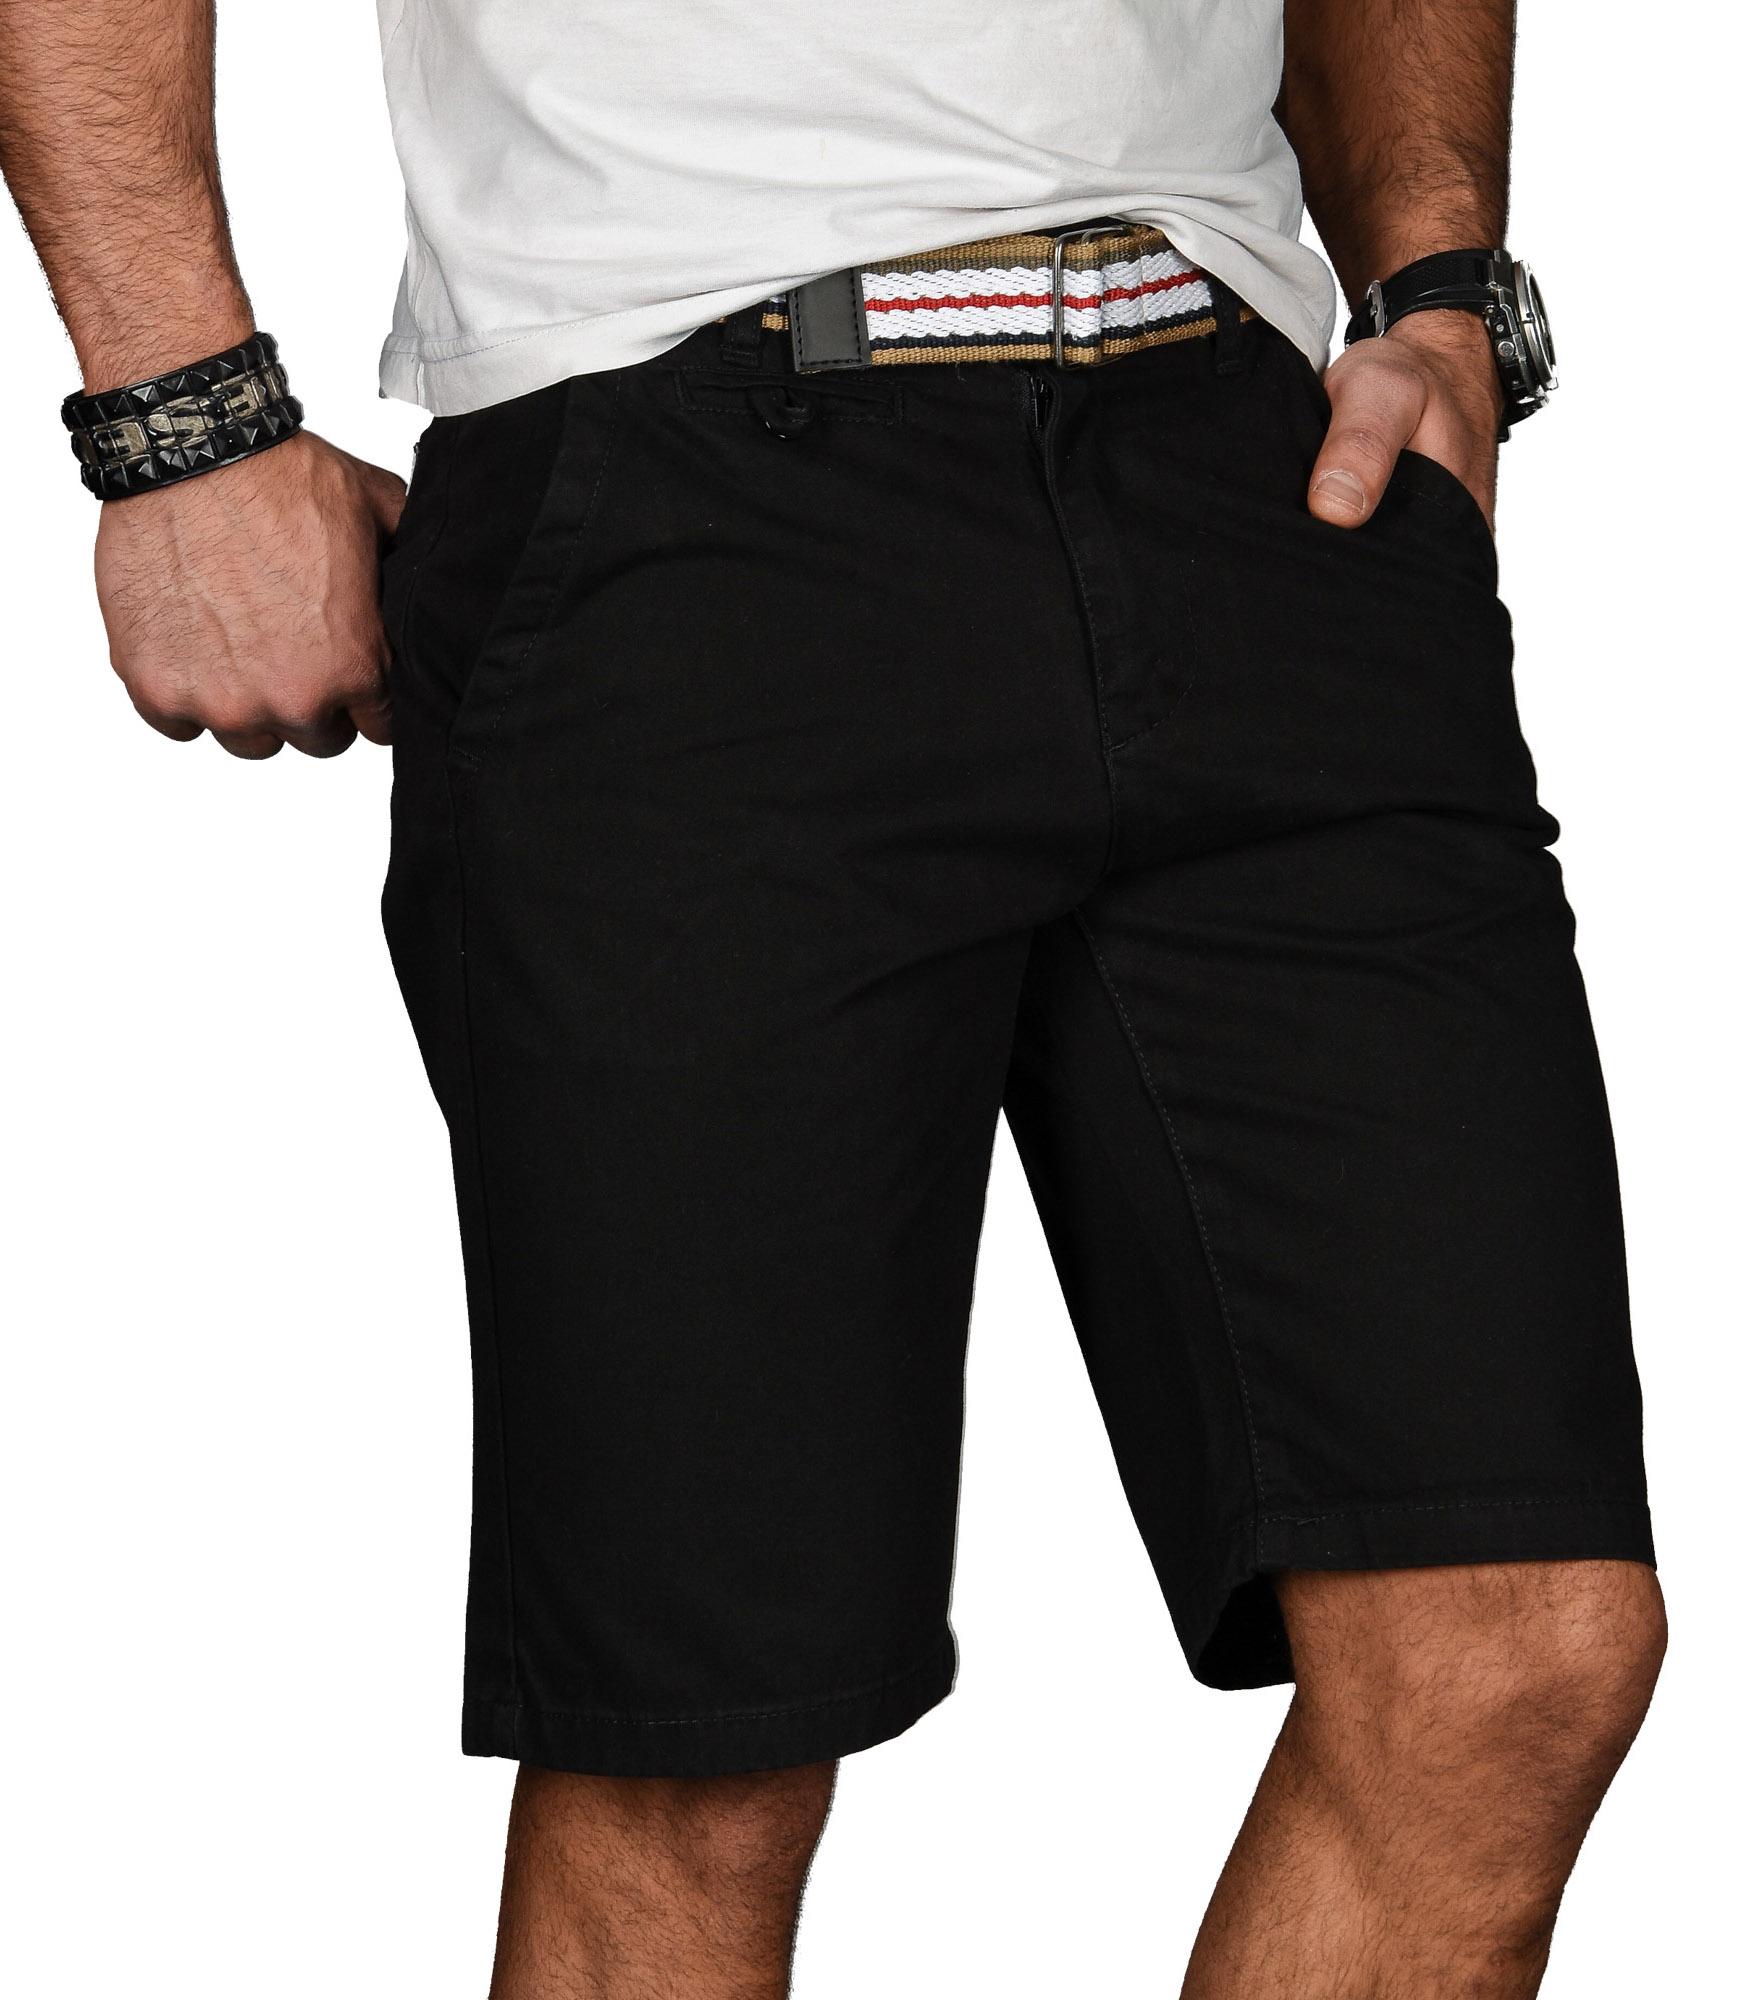 A-Salvarini-Herren-Shorts-kurze-Sommer-Hose-mit-Guertel-Short-Bermuda-NEU-AS096 Indexbild 3